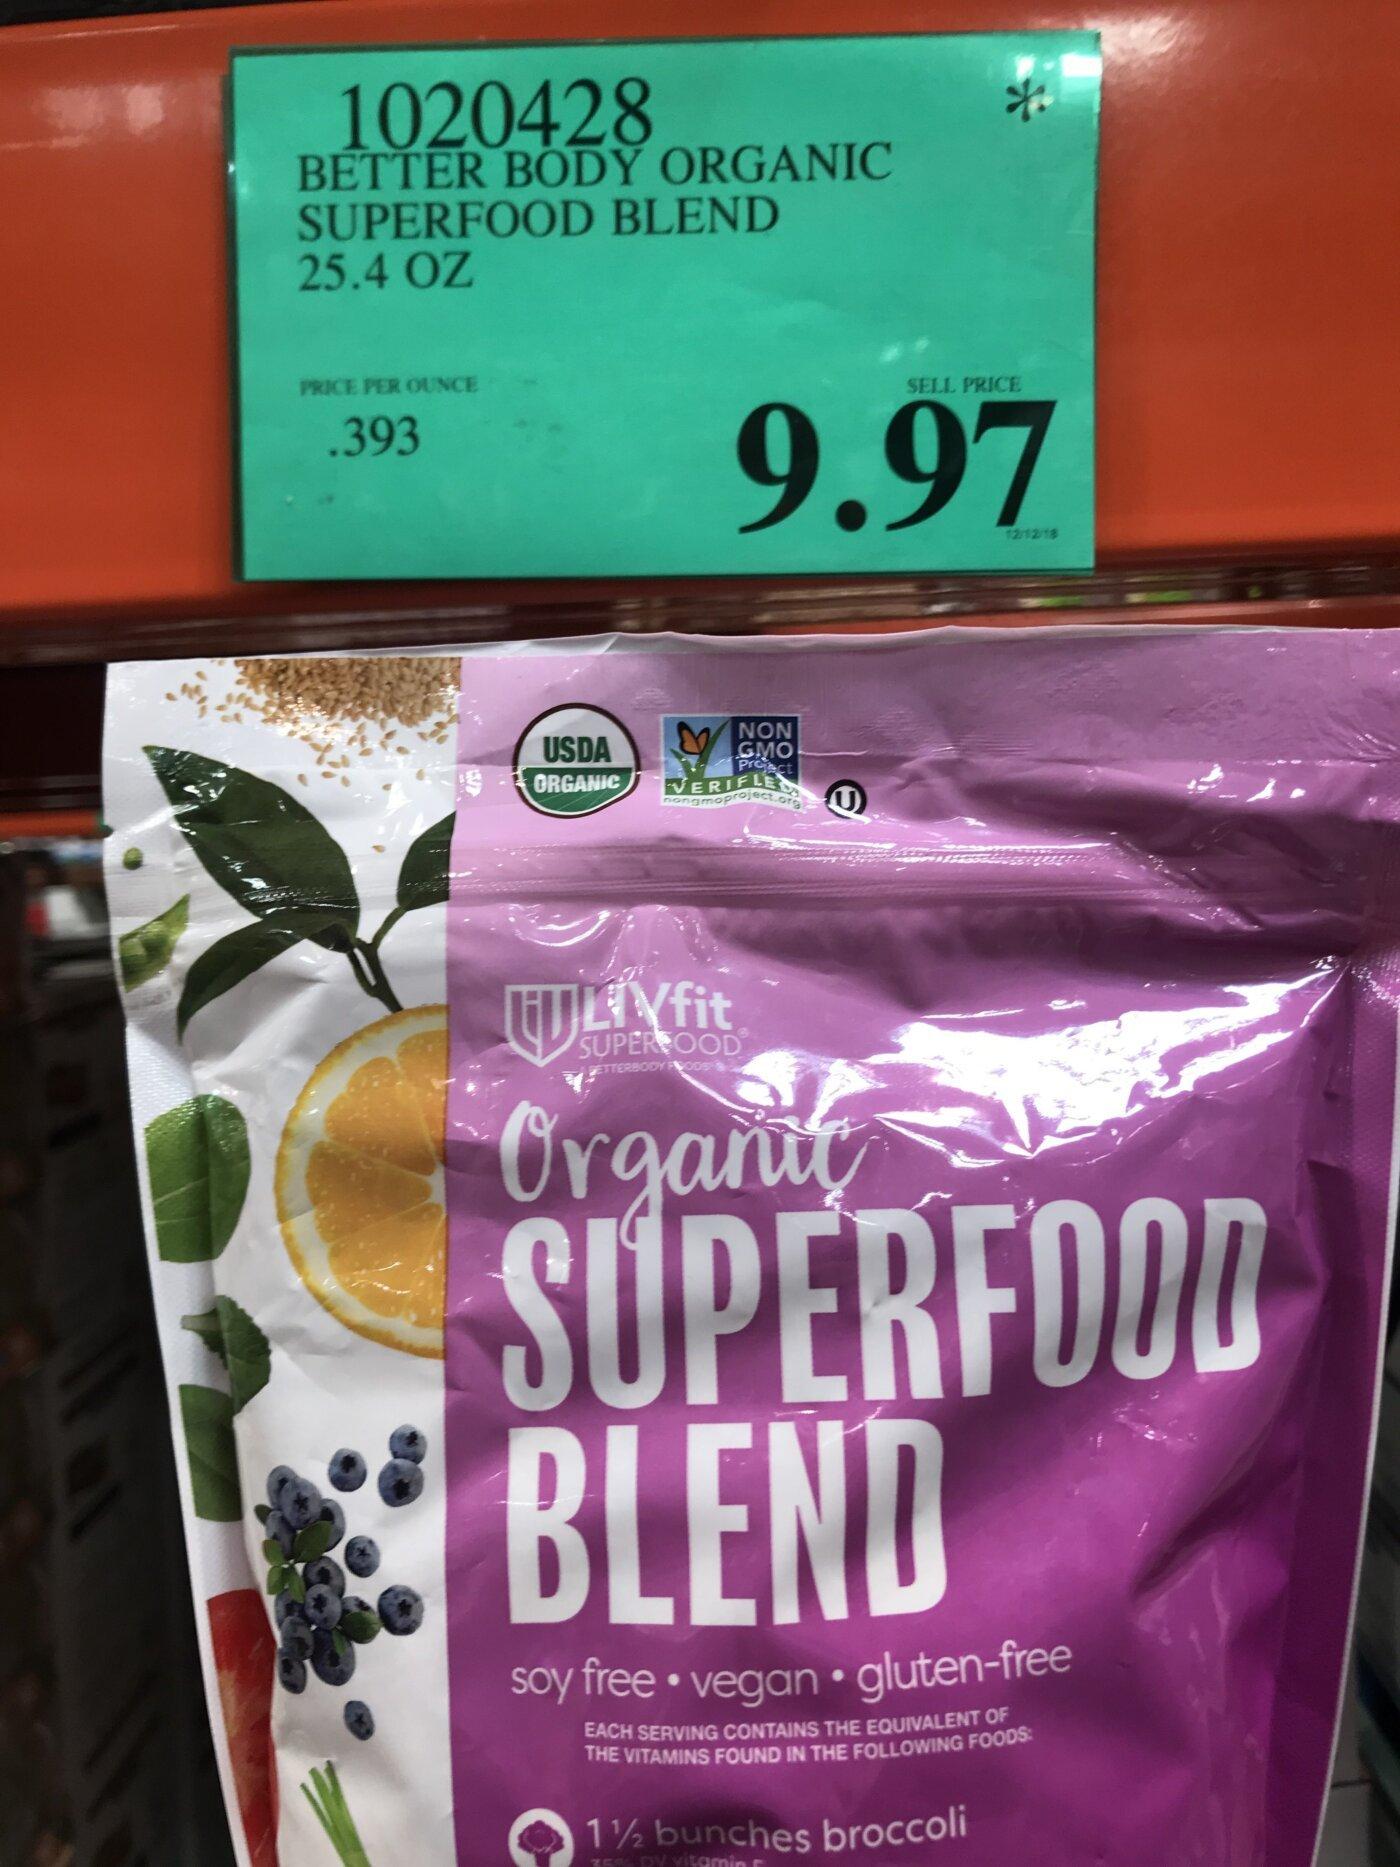 Better Body LIVfit Organic Superfood